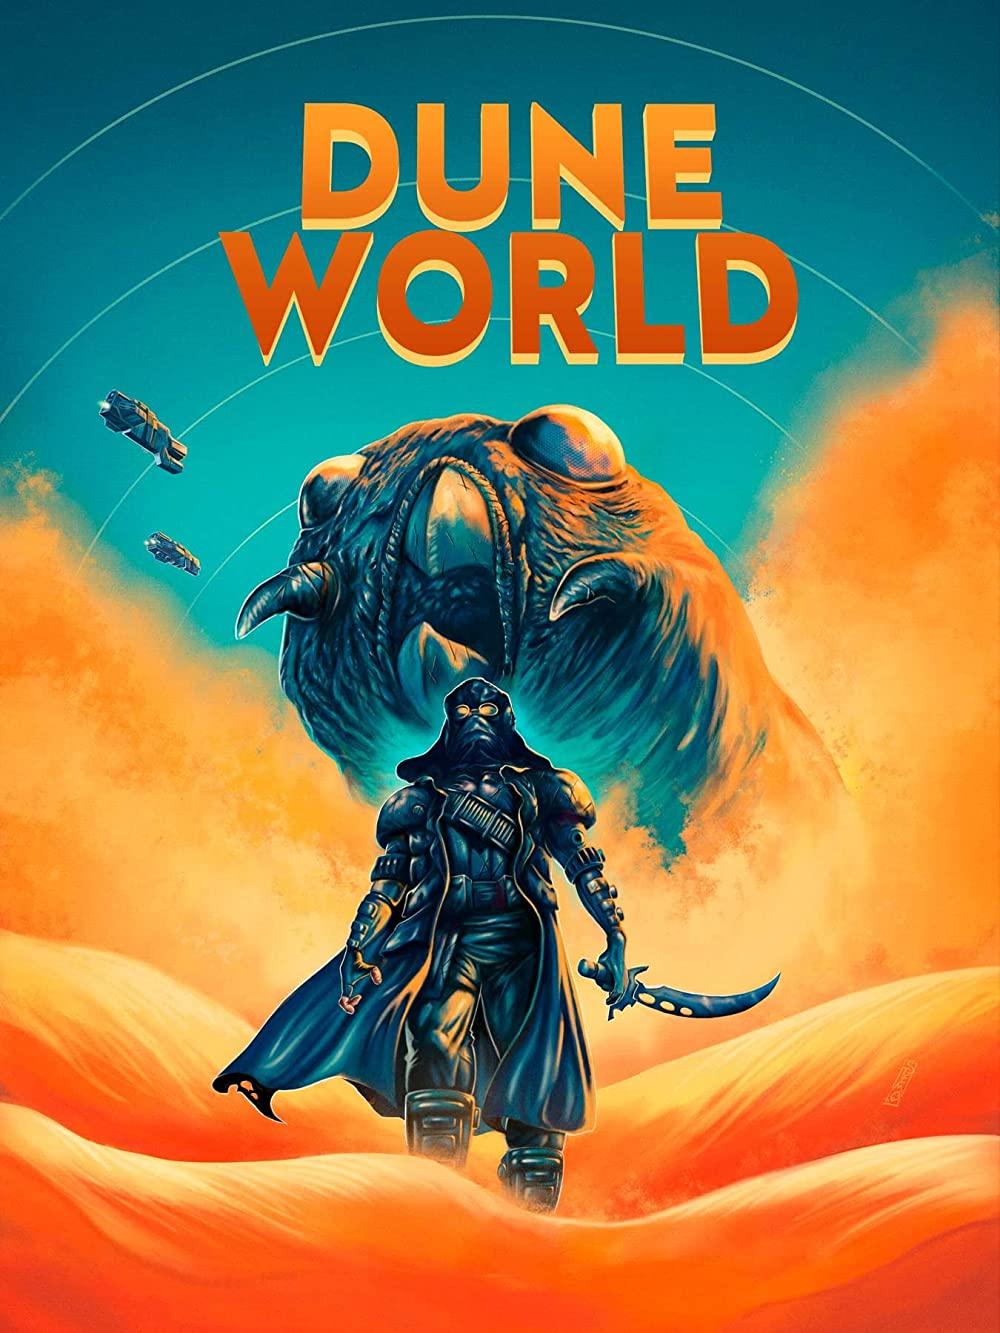 Dune World 2021 English 480p AMZN HDRip ESub 200MB Download